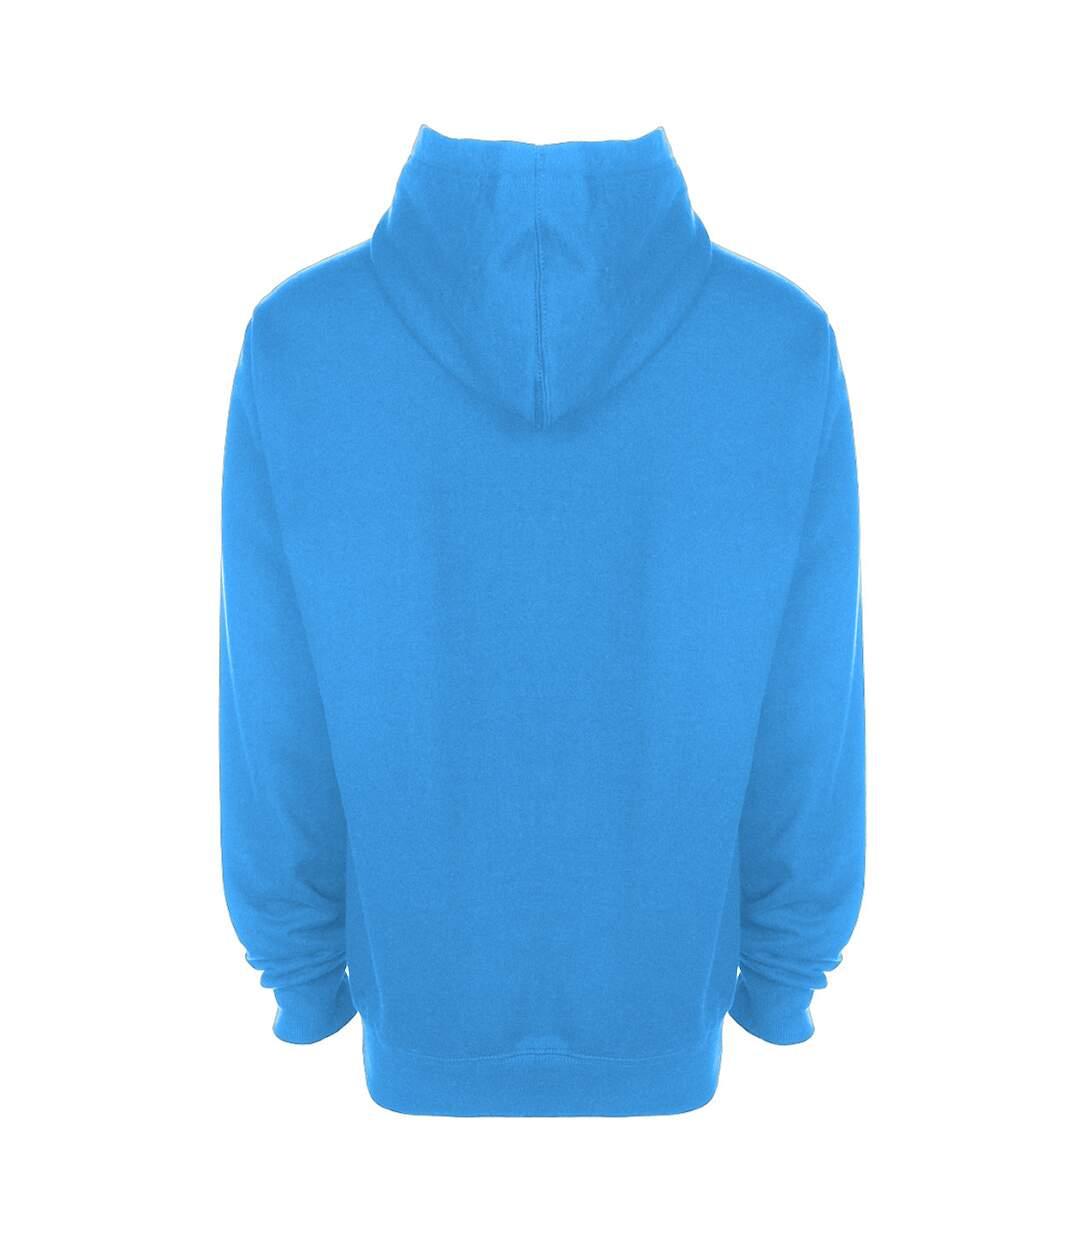 FDM Unisex Tagless Hooded Sweatshirt / Hoodie (Ash) - UTBC2031